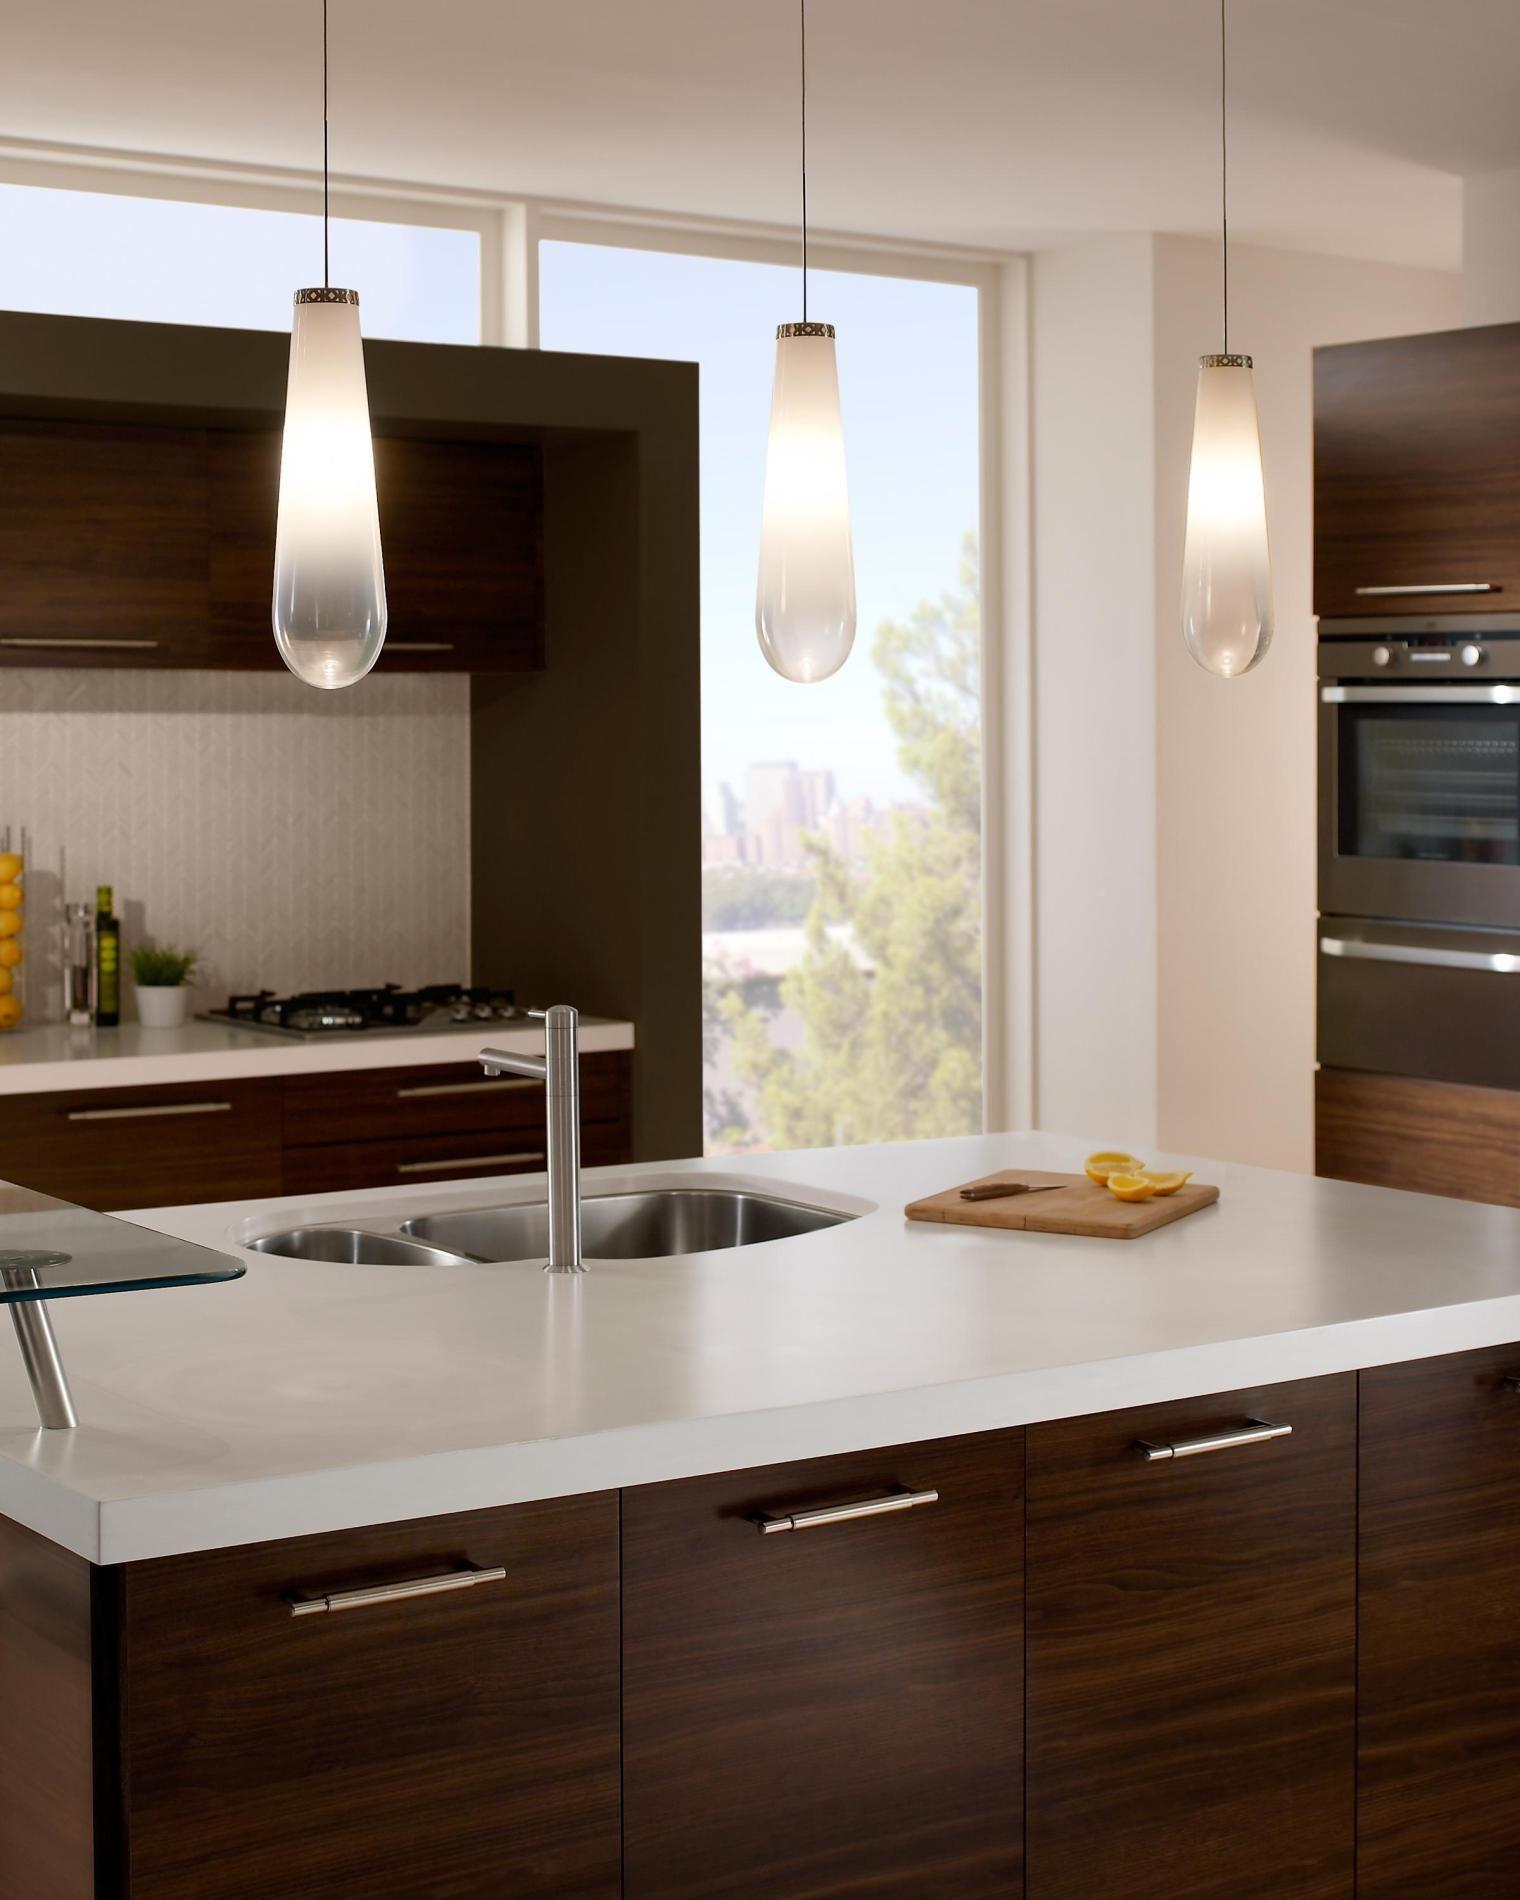 Multi Pendant Lighting Kitchen Kitchen Pendant Lights Over The Kitchen Island Duo Walled